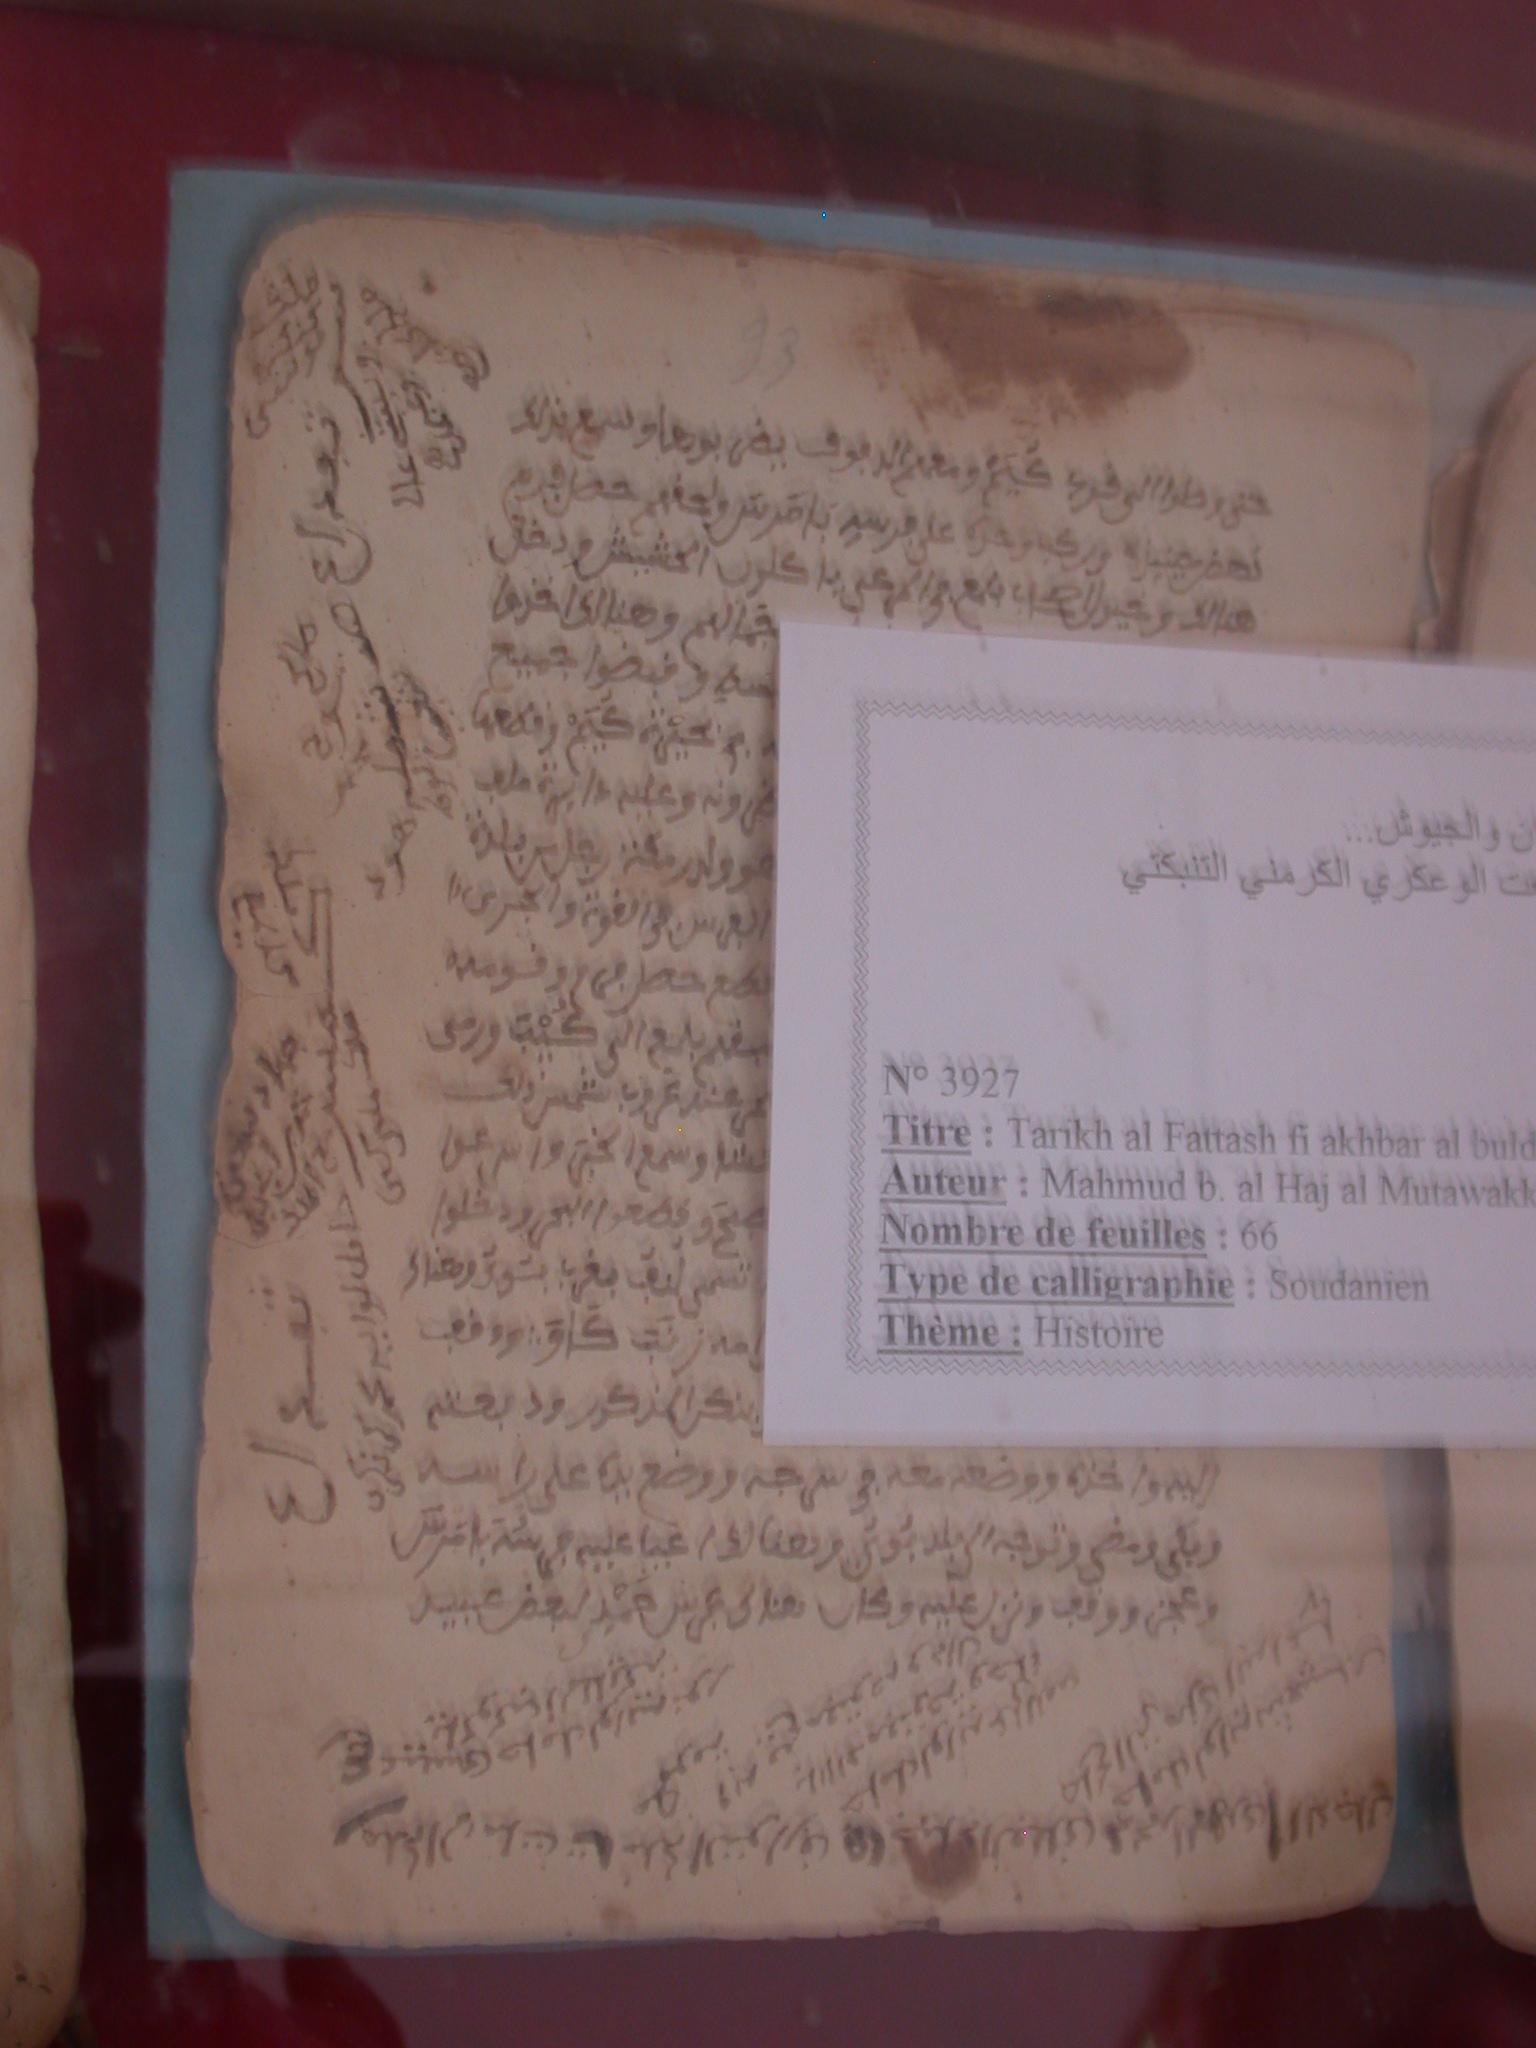 Manuscript, Tarikh al Fattash fi akhbar al buldan wal juyush wa akabir, Ahmed Baba Institute, Institut des Hautes Etudes et de Recherches Islamiques, Timbuktu, Mali